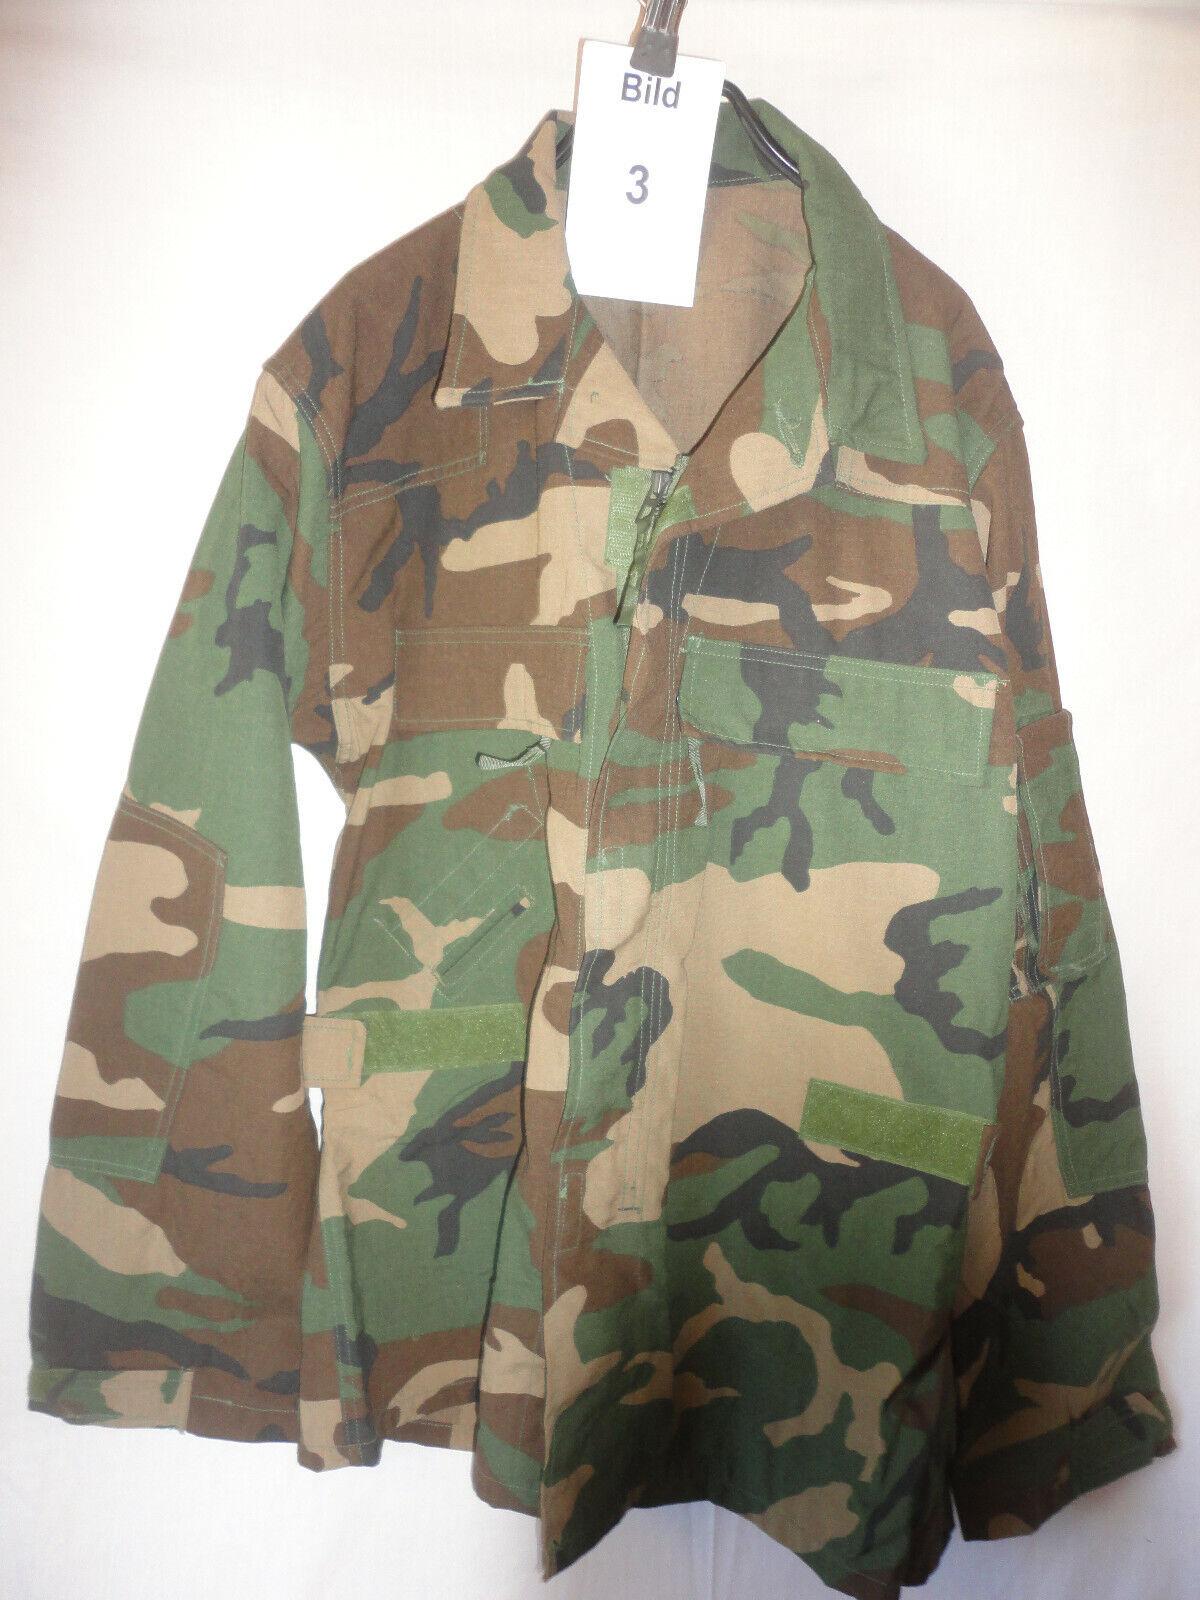 US Coat,Aircrew Bild 3 = M - R